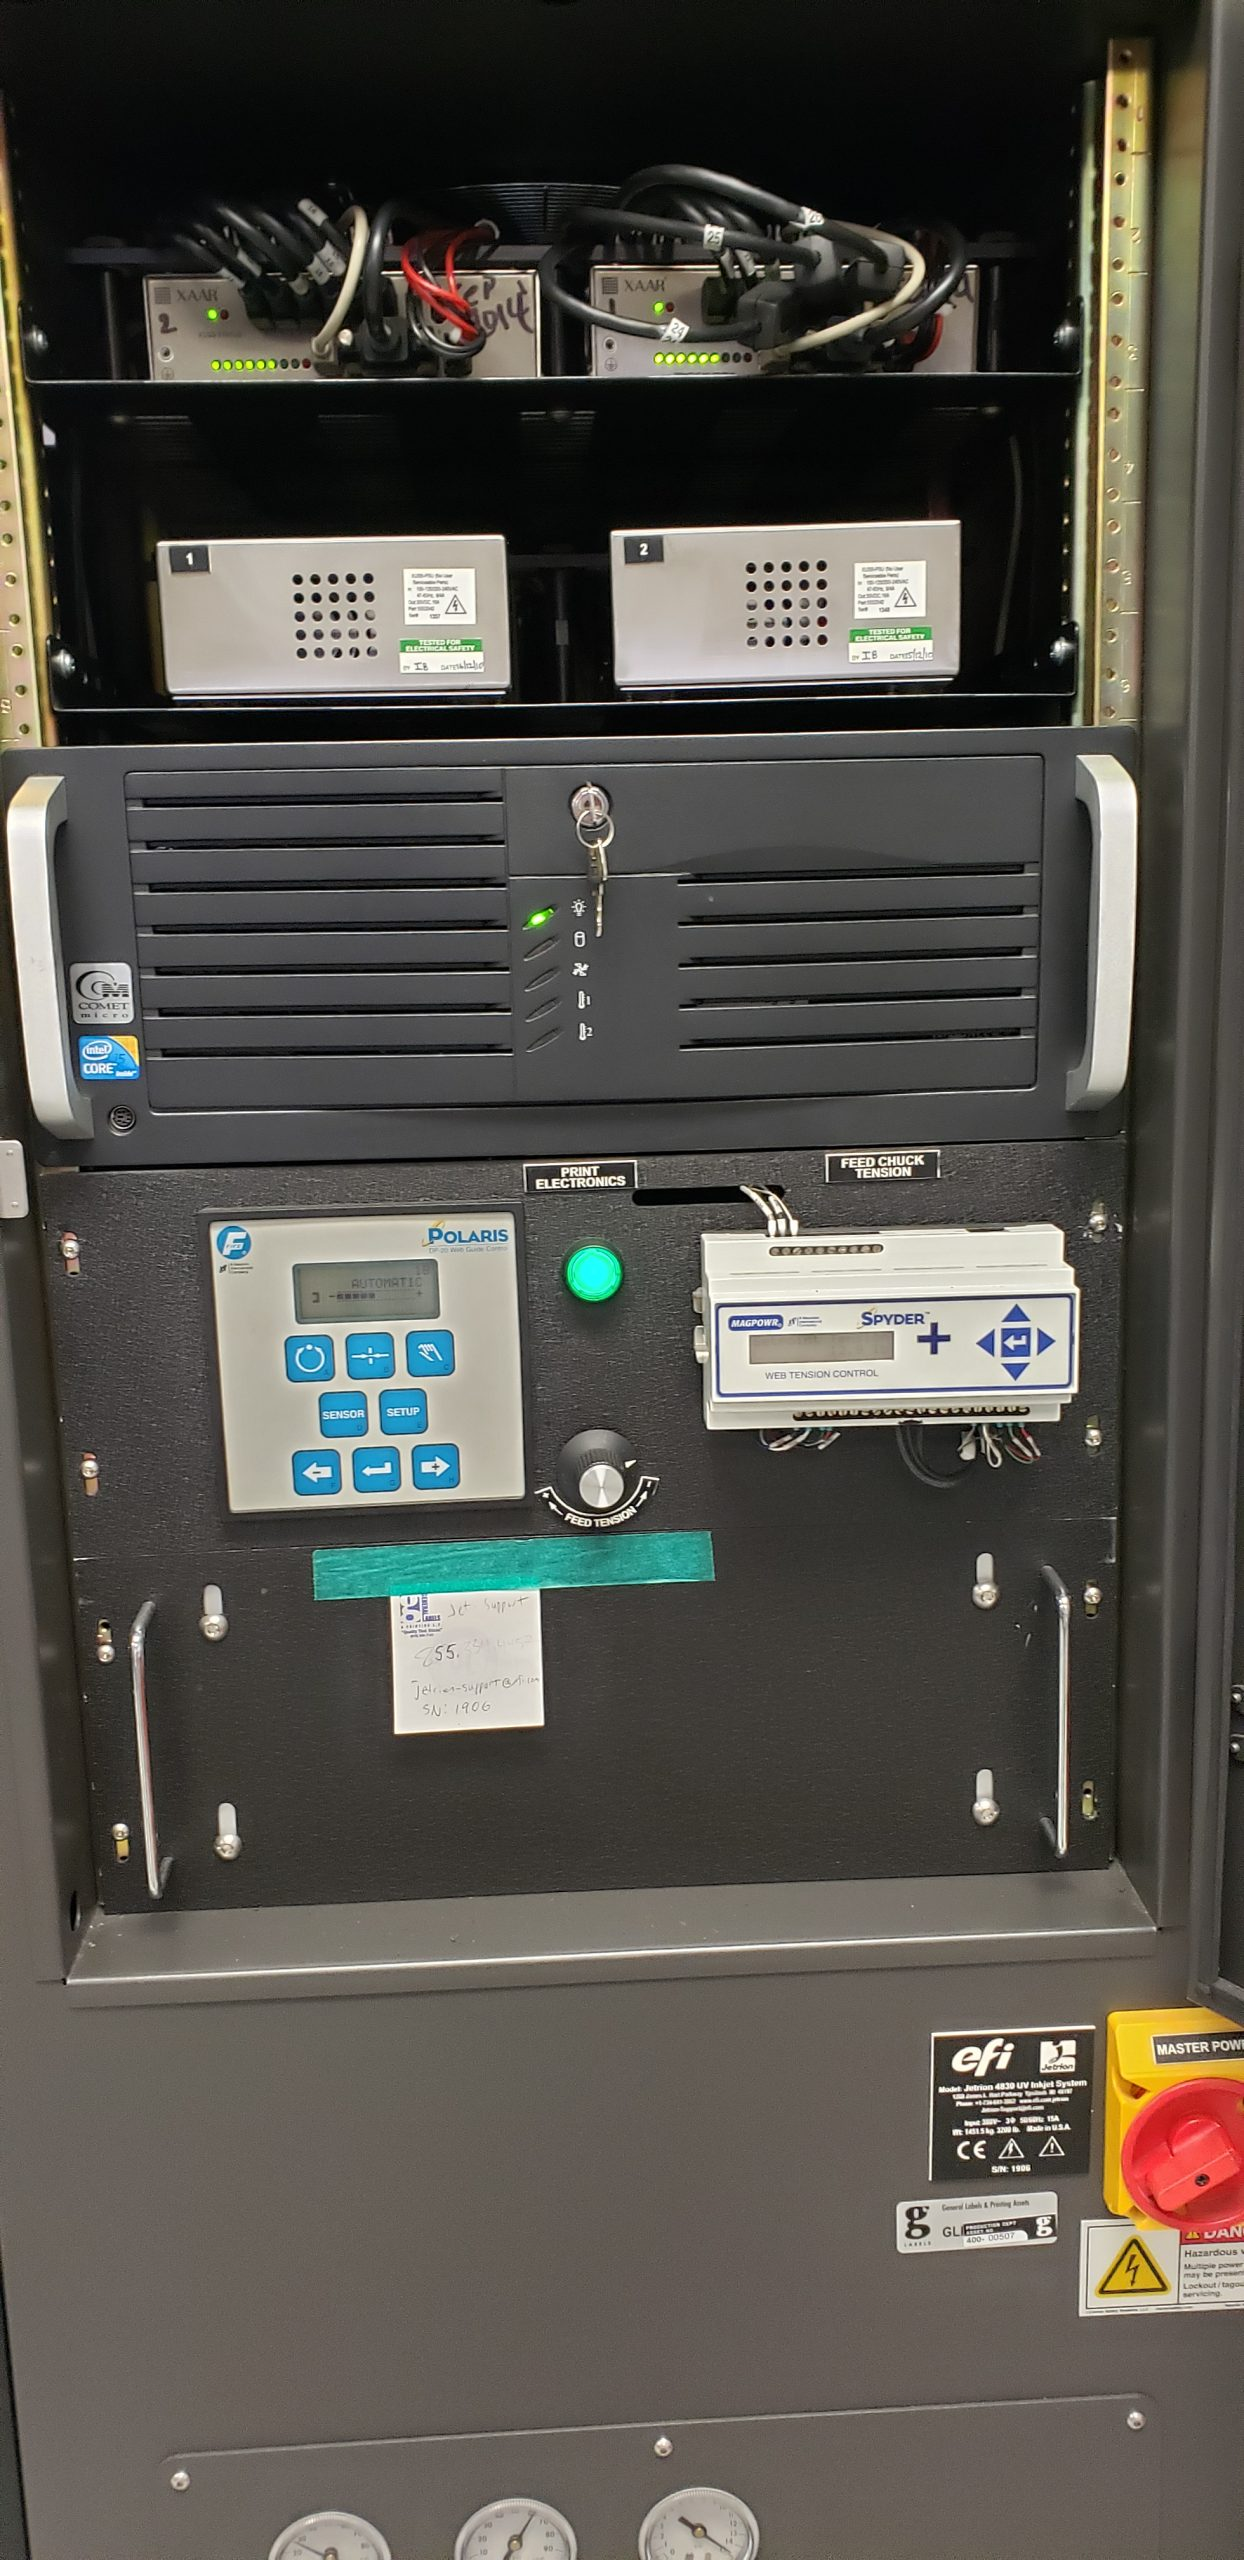 EFI Jetrion 4830 - Used Flexo Printing Presses and Used Flexographic Equipment-2